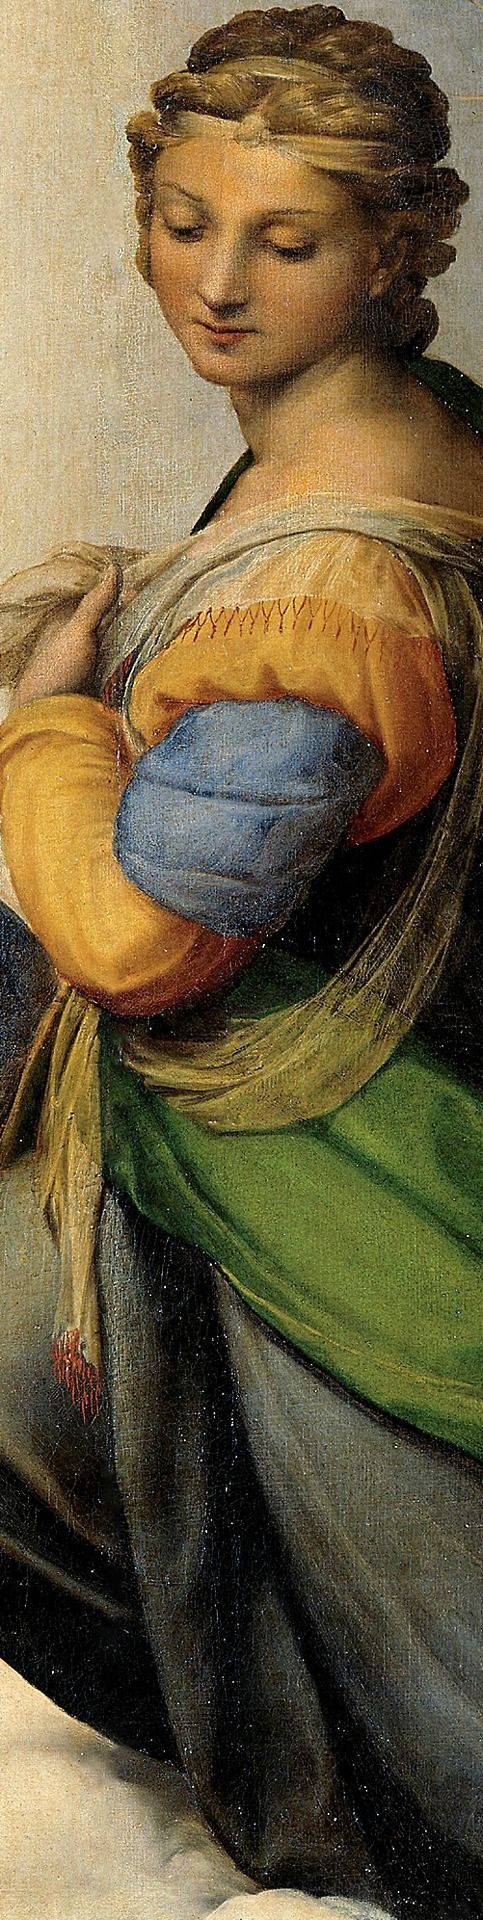 "Detalle de la ""Madonna"" de la Sixtina de Rafael (1513-14)"